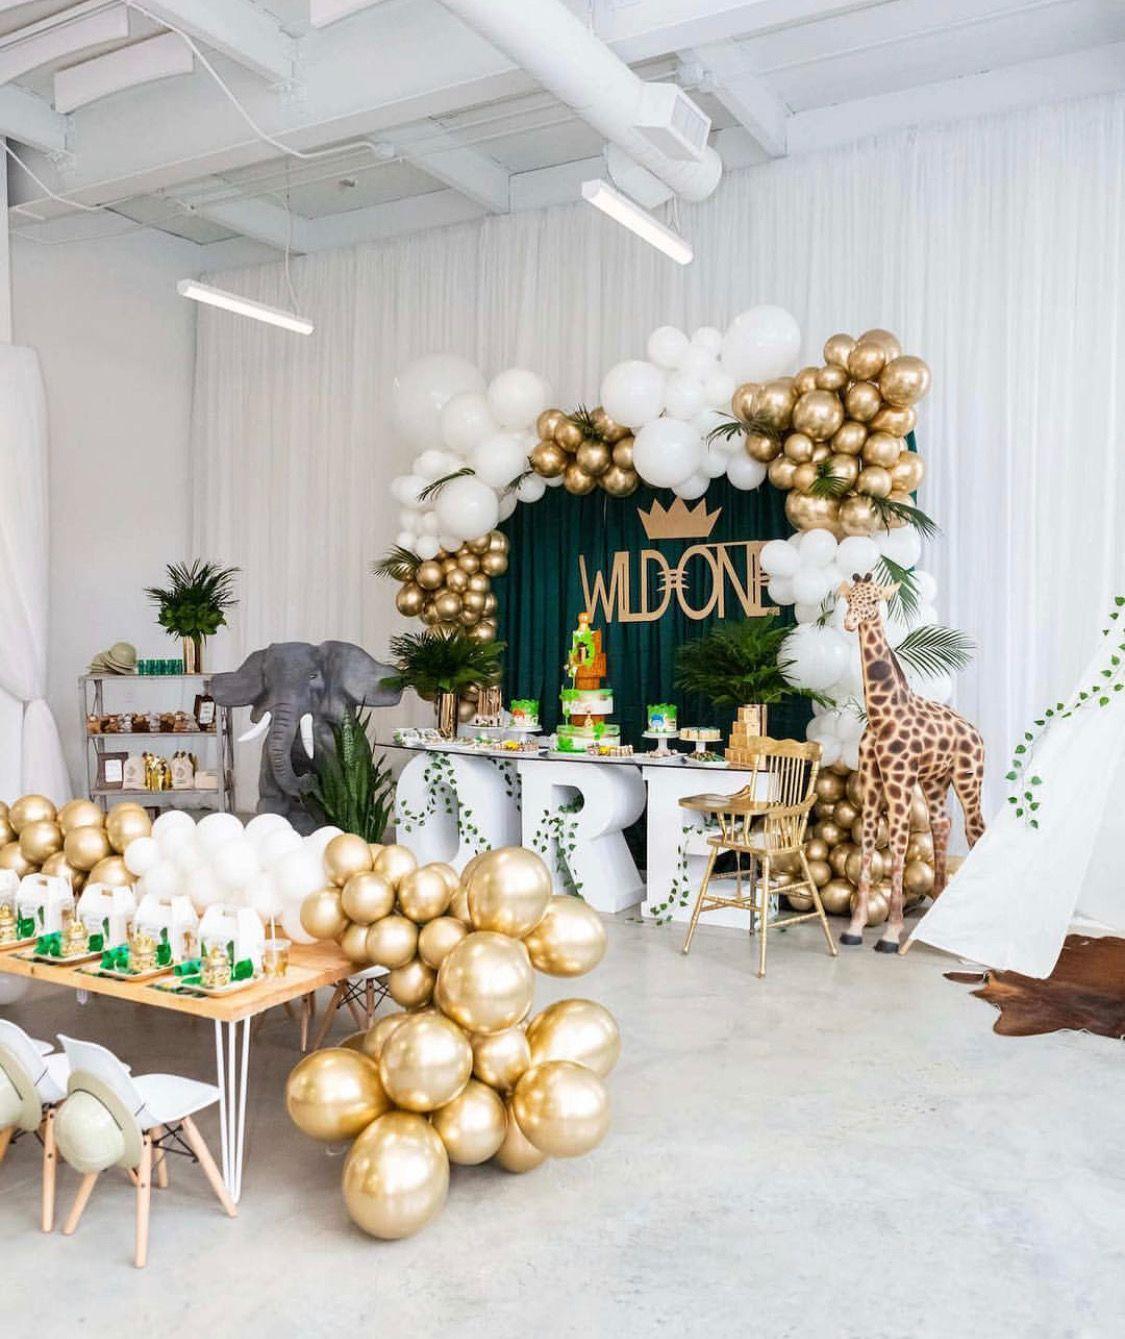 Wild One Birthday Party Decor Balloon Decor Inspiration